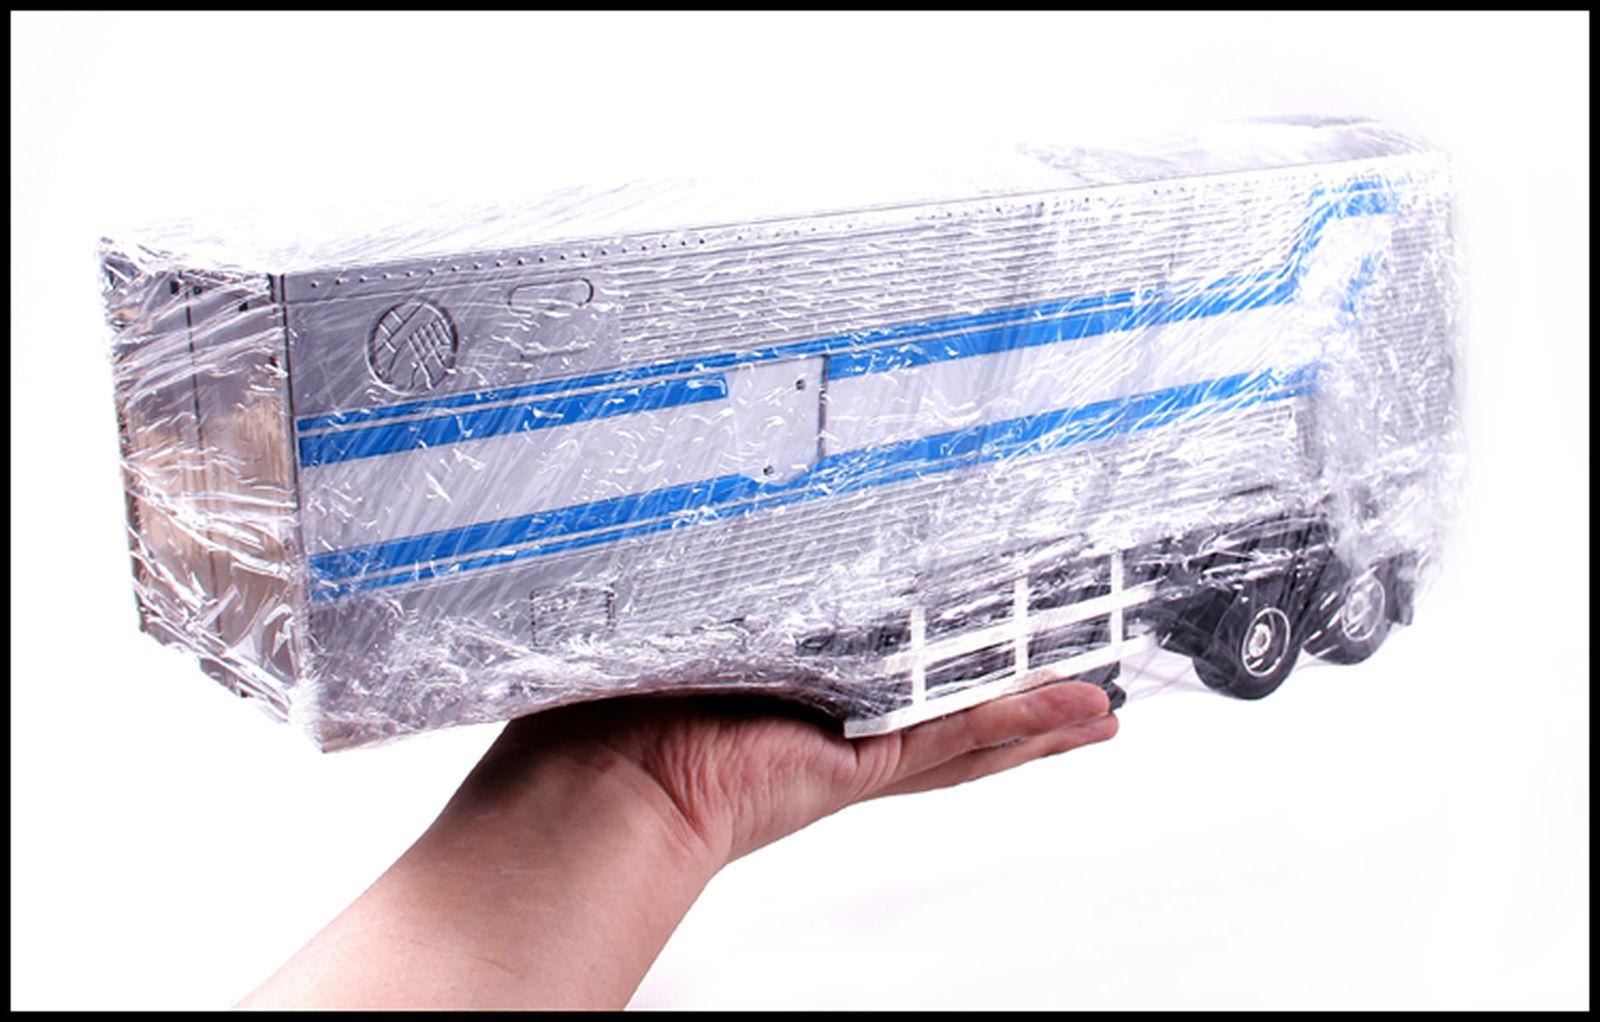 Transformatoren optimus prime op commander mpp10 weijiang trailer weihnachtsgeschenk